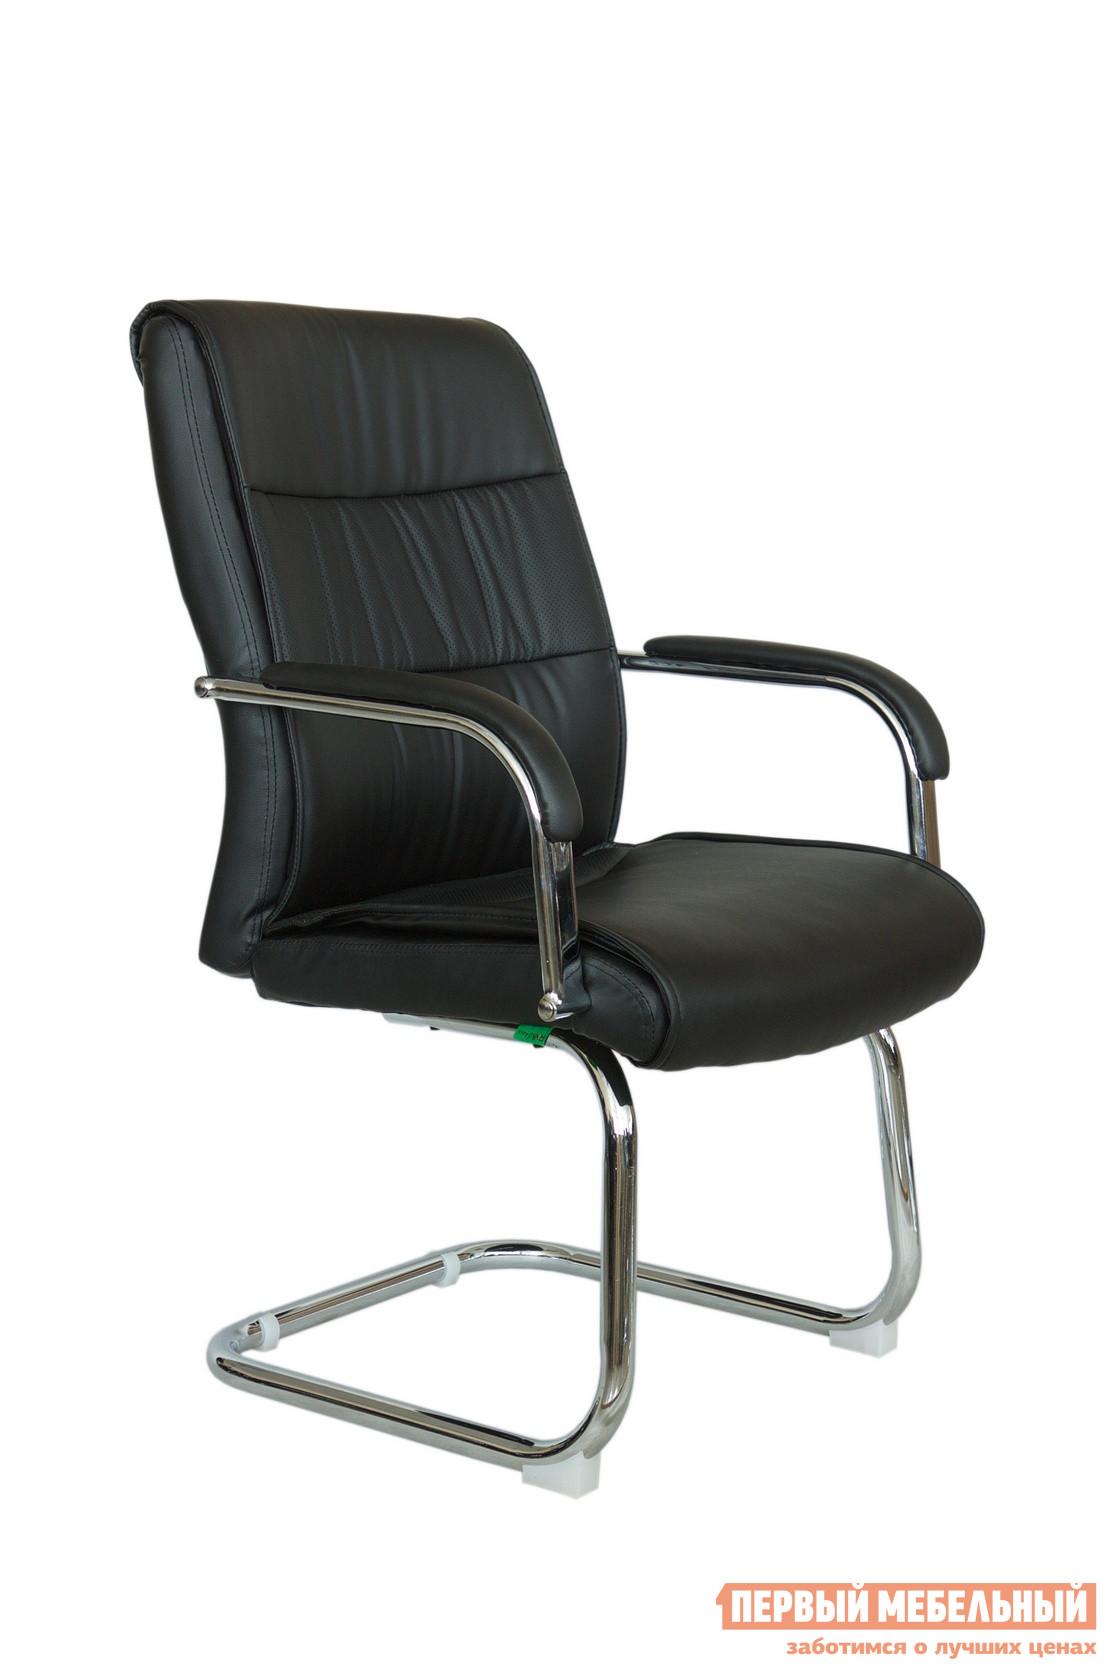 Офисный стул Riva Кресло RCH 9249 - 4 пластиковый стул рихаус riva bistrot